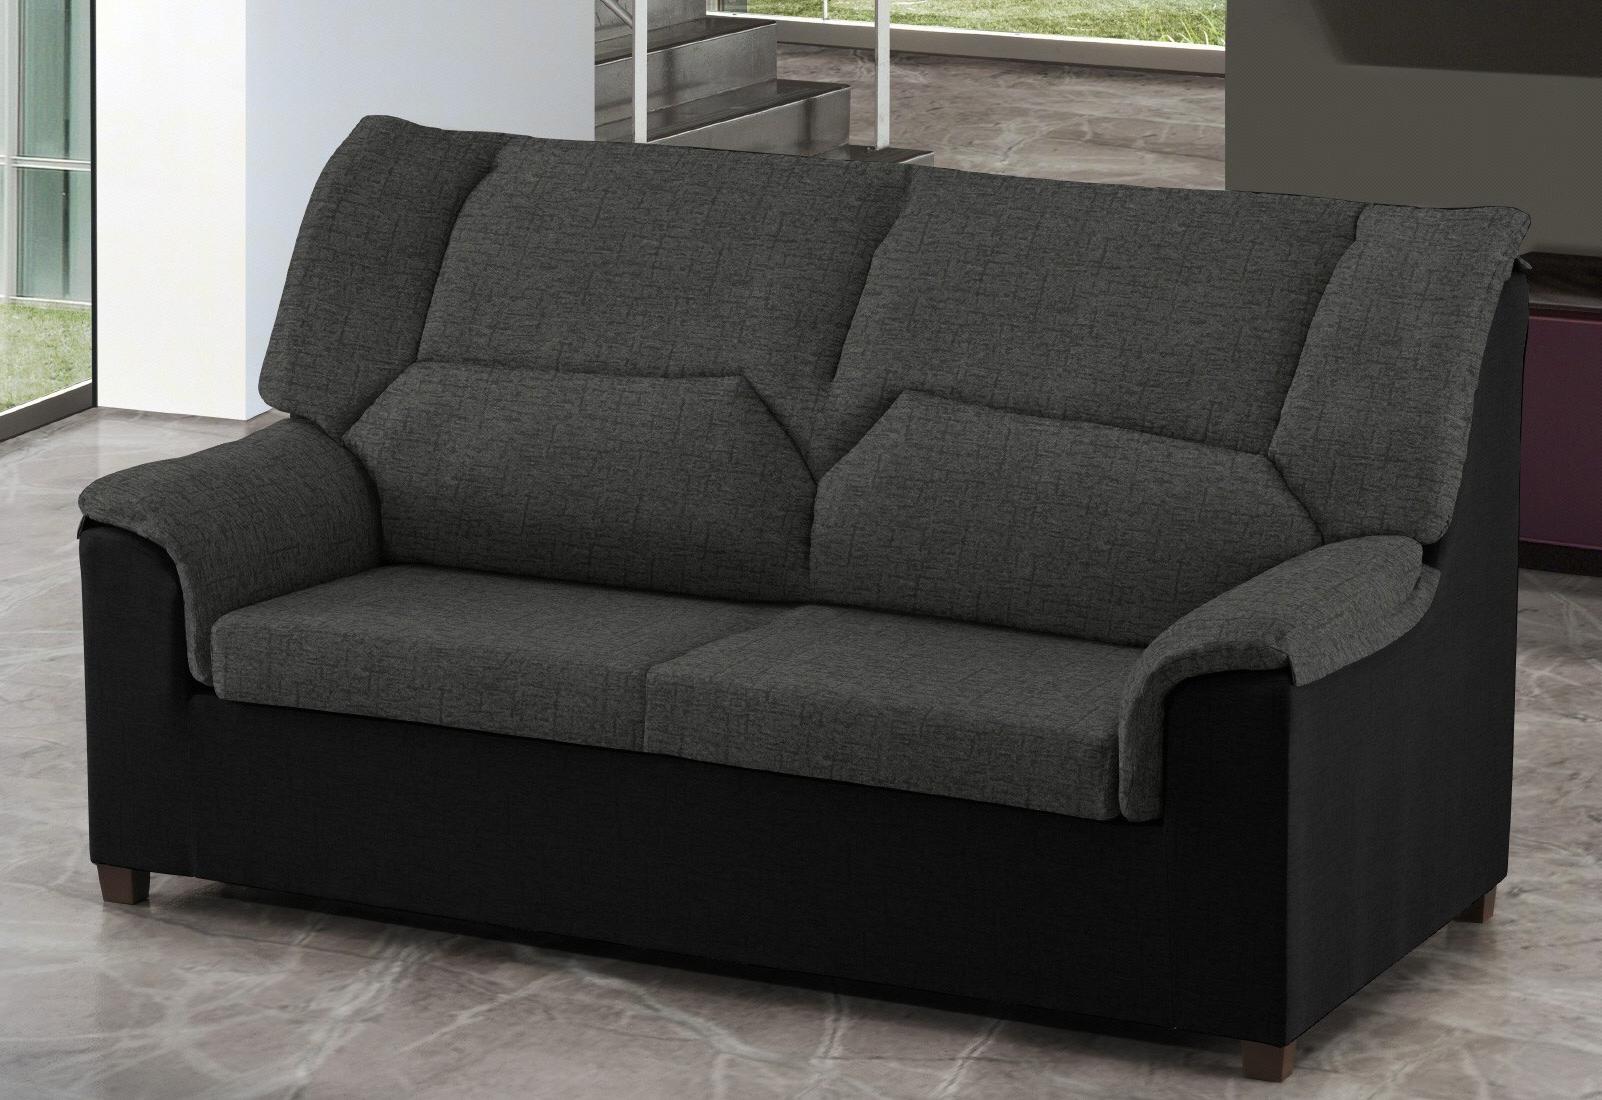 Sofas Muy Baratos Thdr Fantastico sofas Muy Baratos 3 2 Plazas sofa Barato Ciboney Net